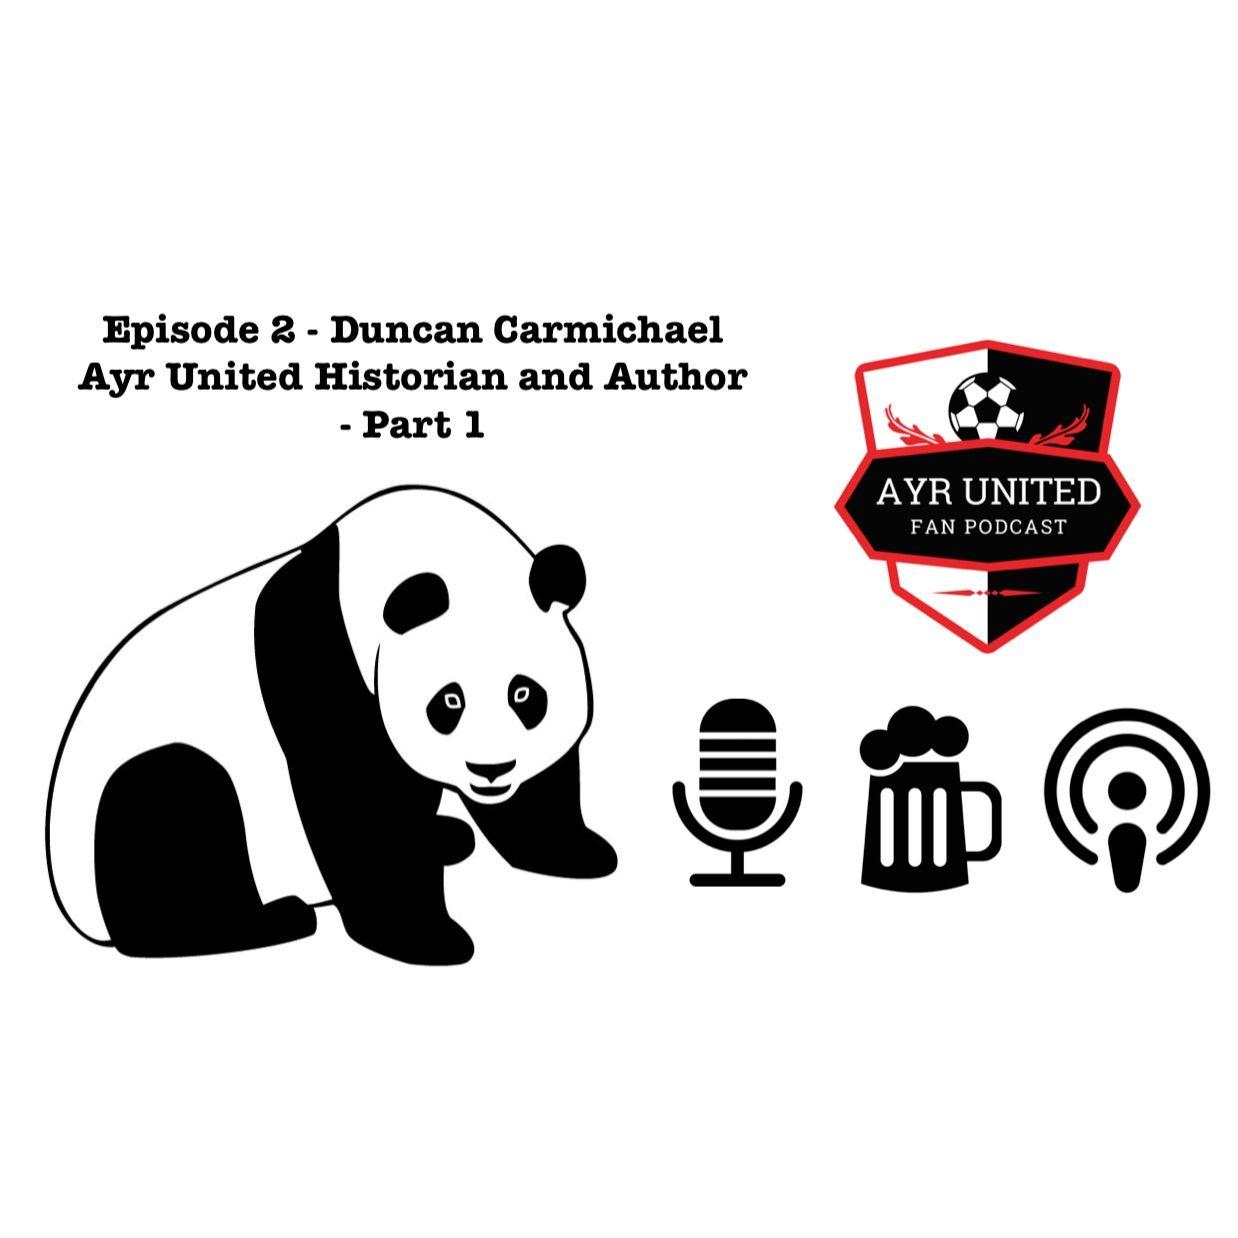 Episode 2 - Duncan Carmichael Ayr United Historian and Author - Part 1